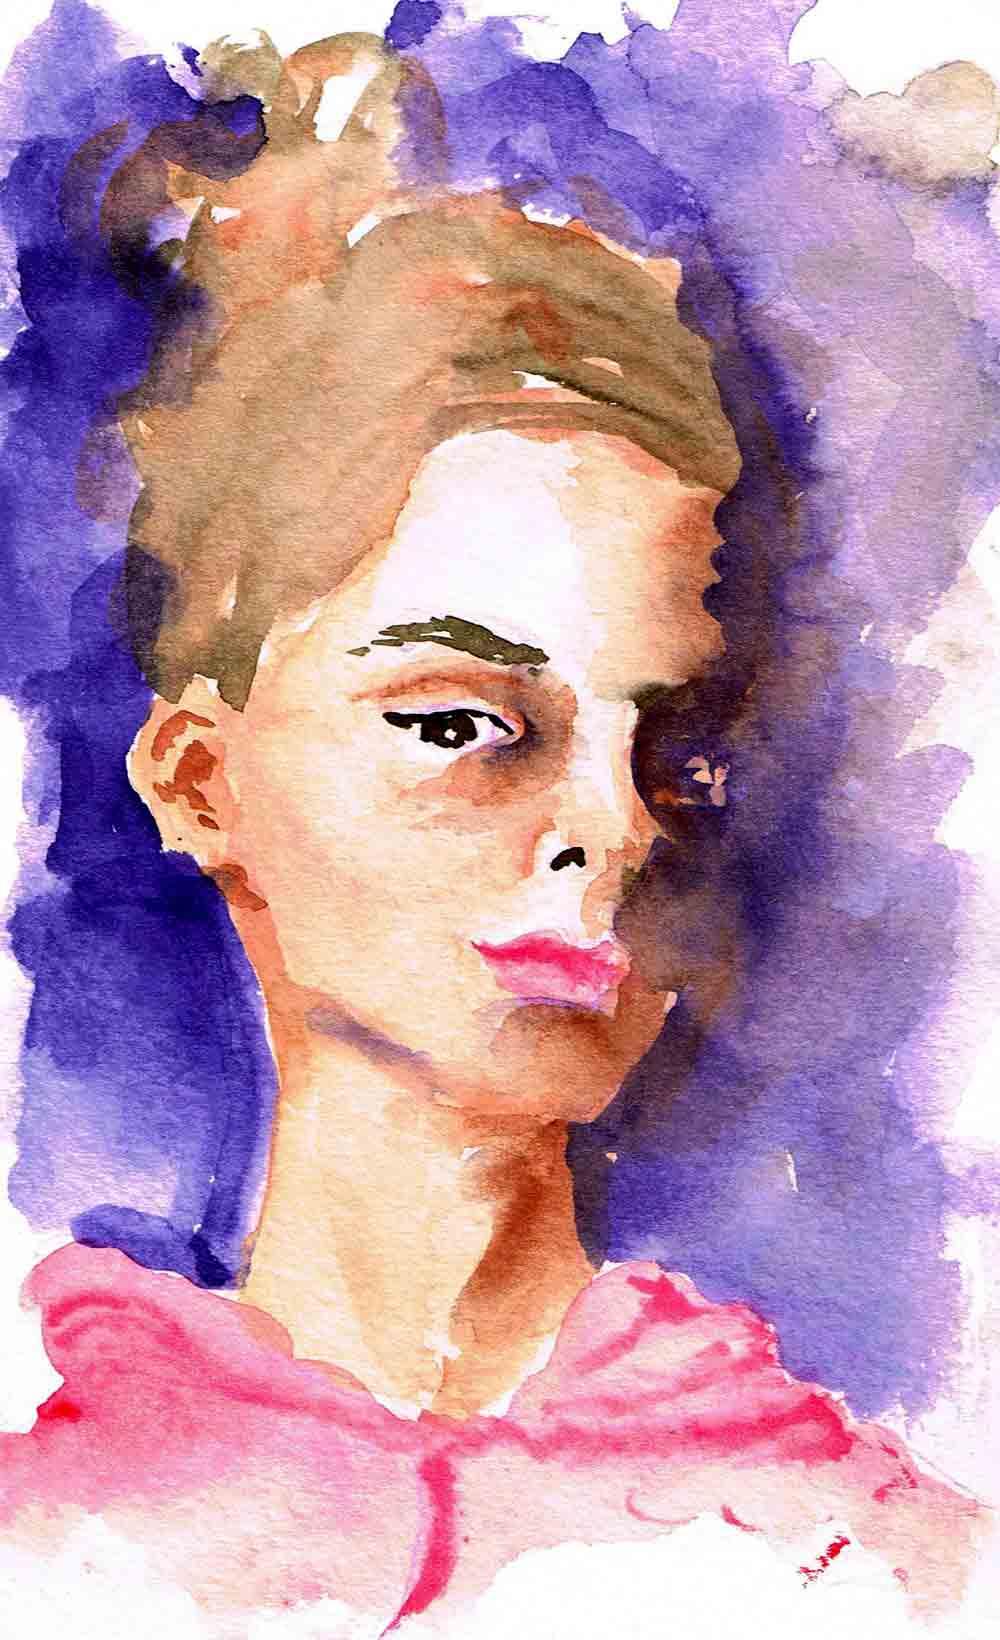 Watercolour-Portraits-5-In-Shadow-kw.jpg